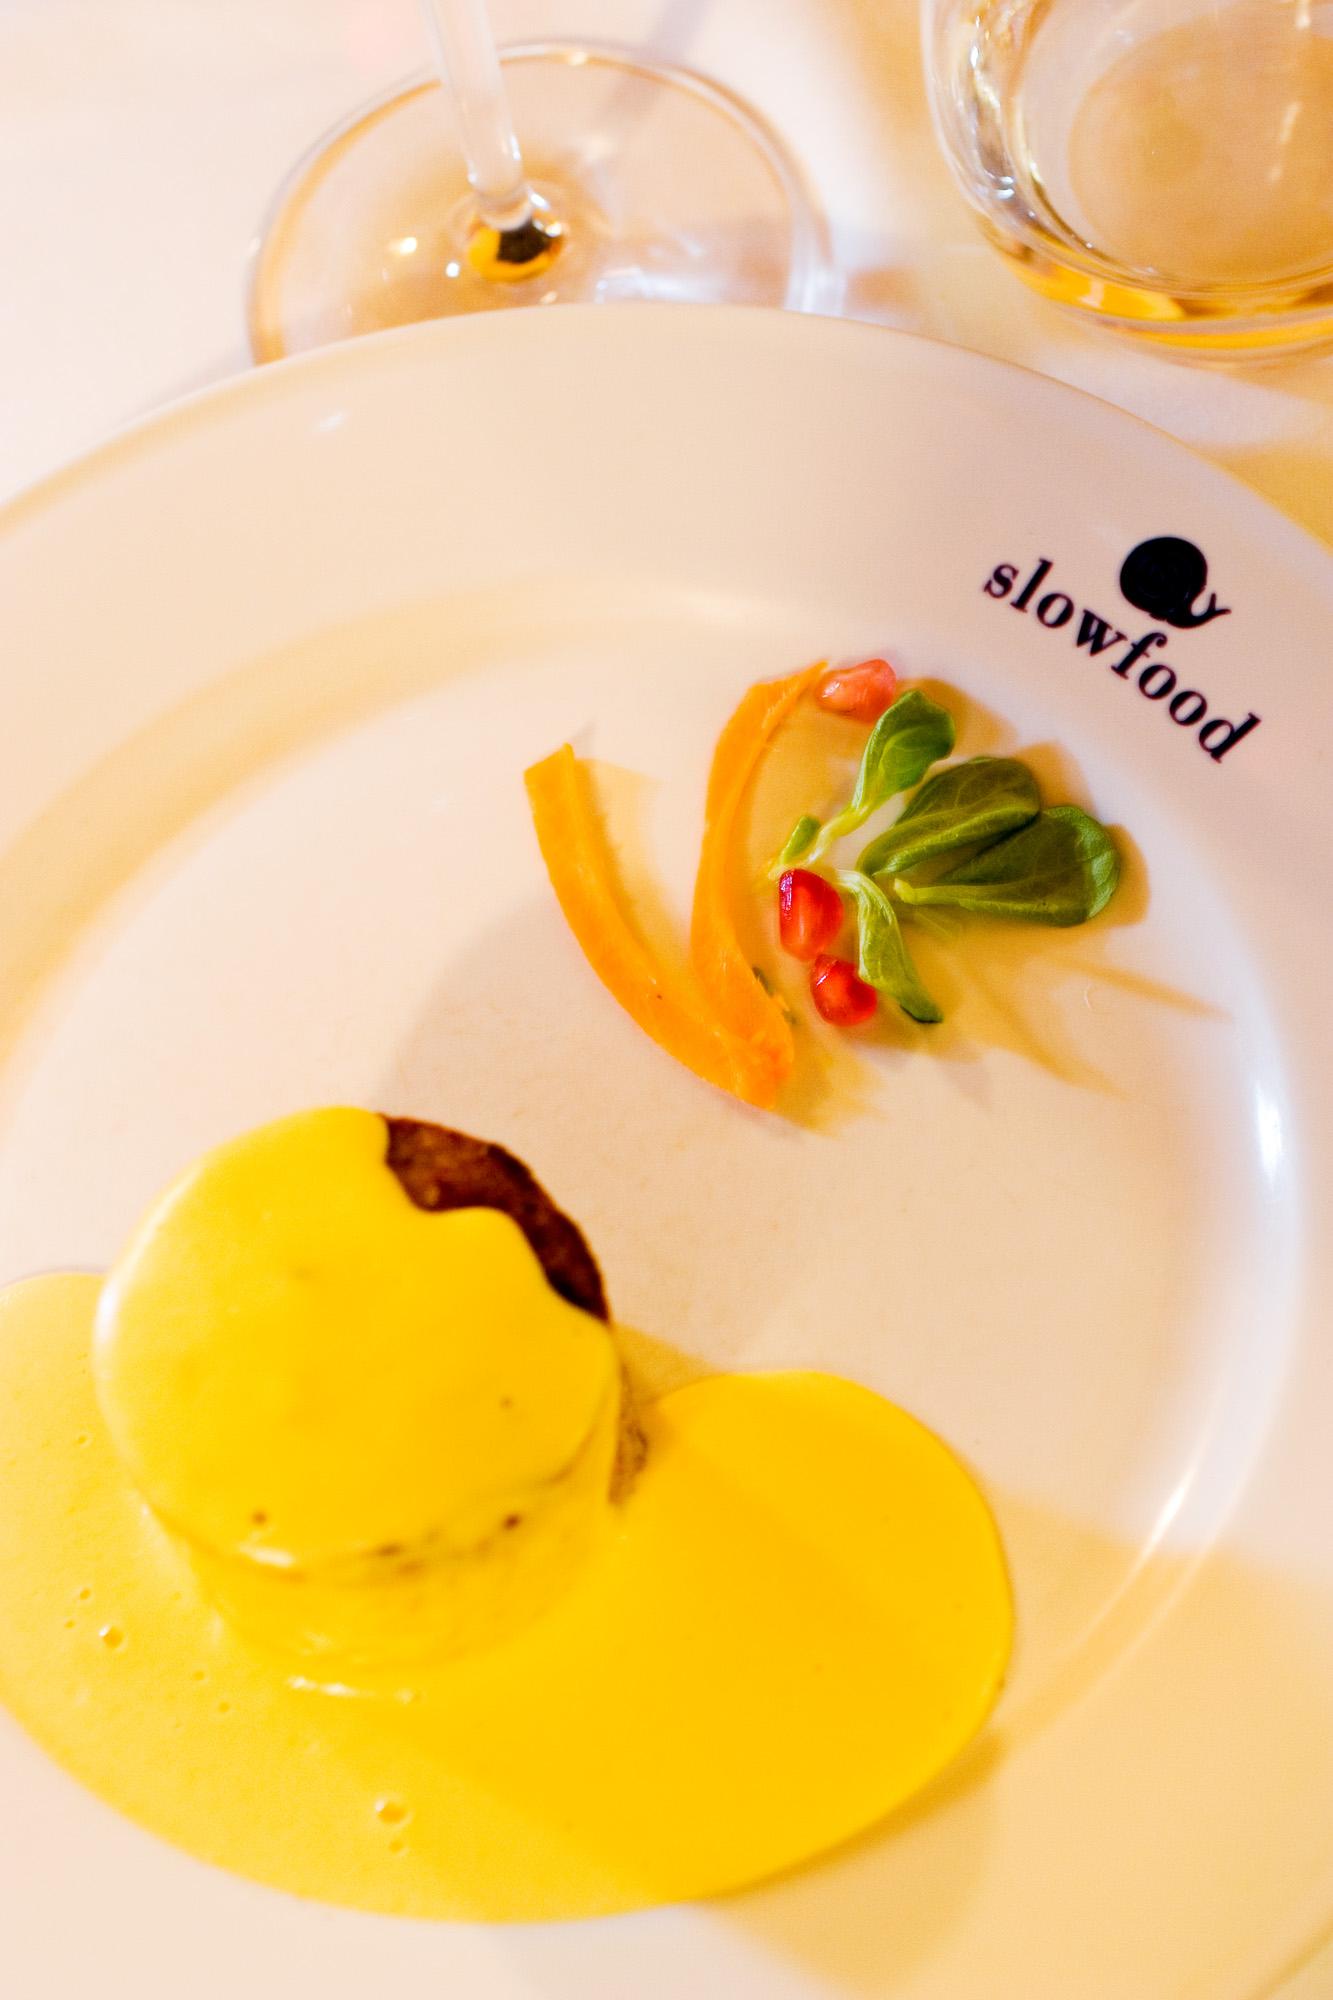 Osteria Boccondivino, The original restaurant of The Slowfood Movement in Bra, Piemonte, Italy